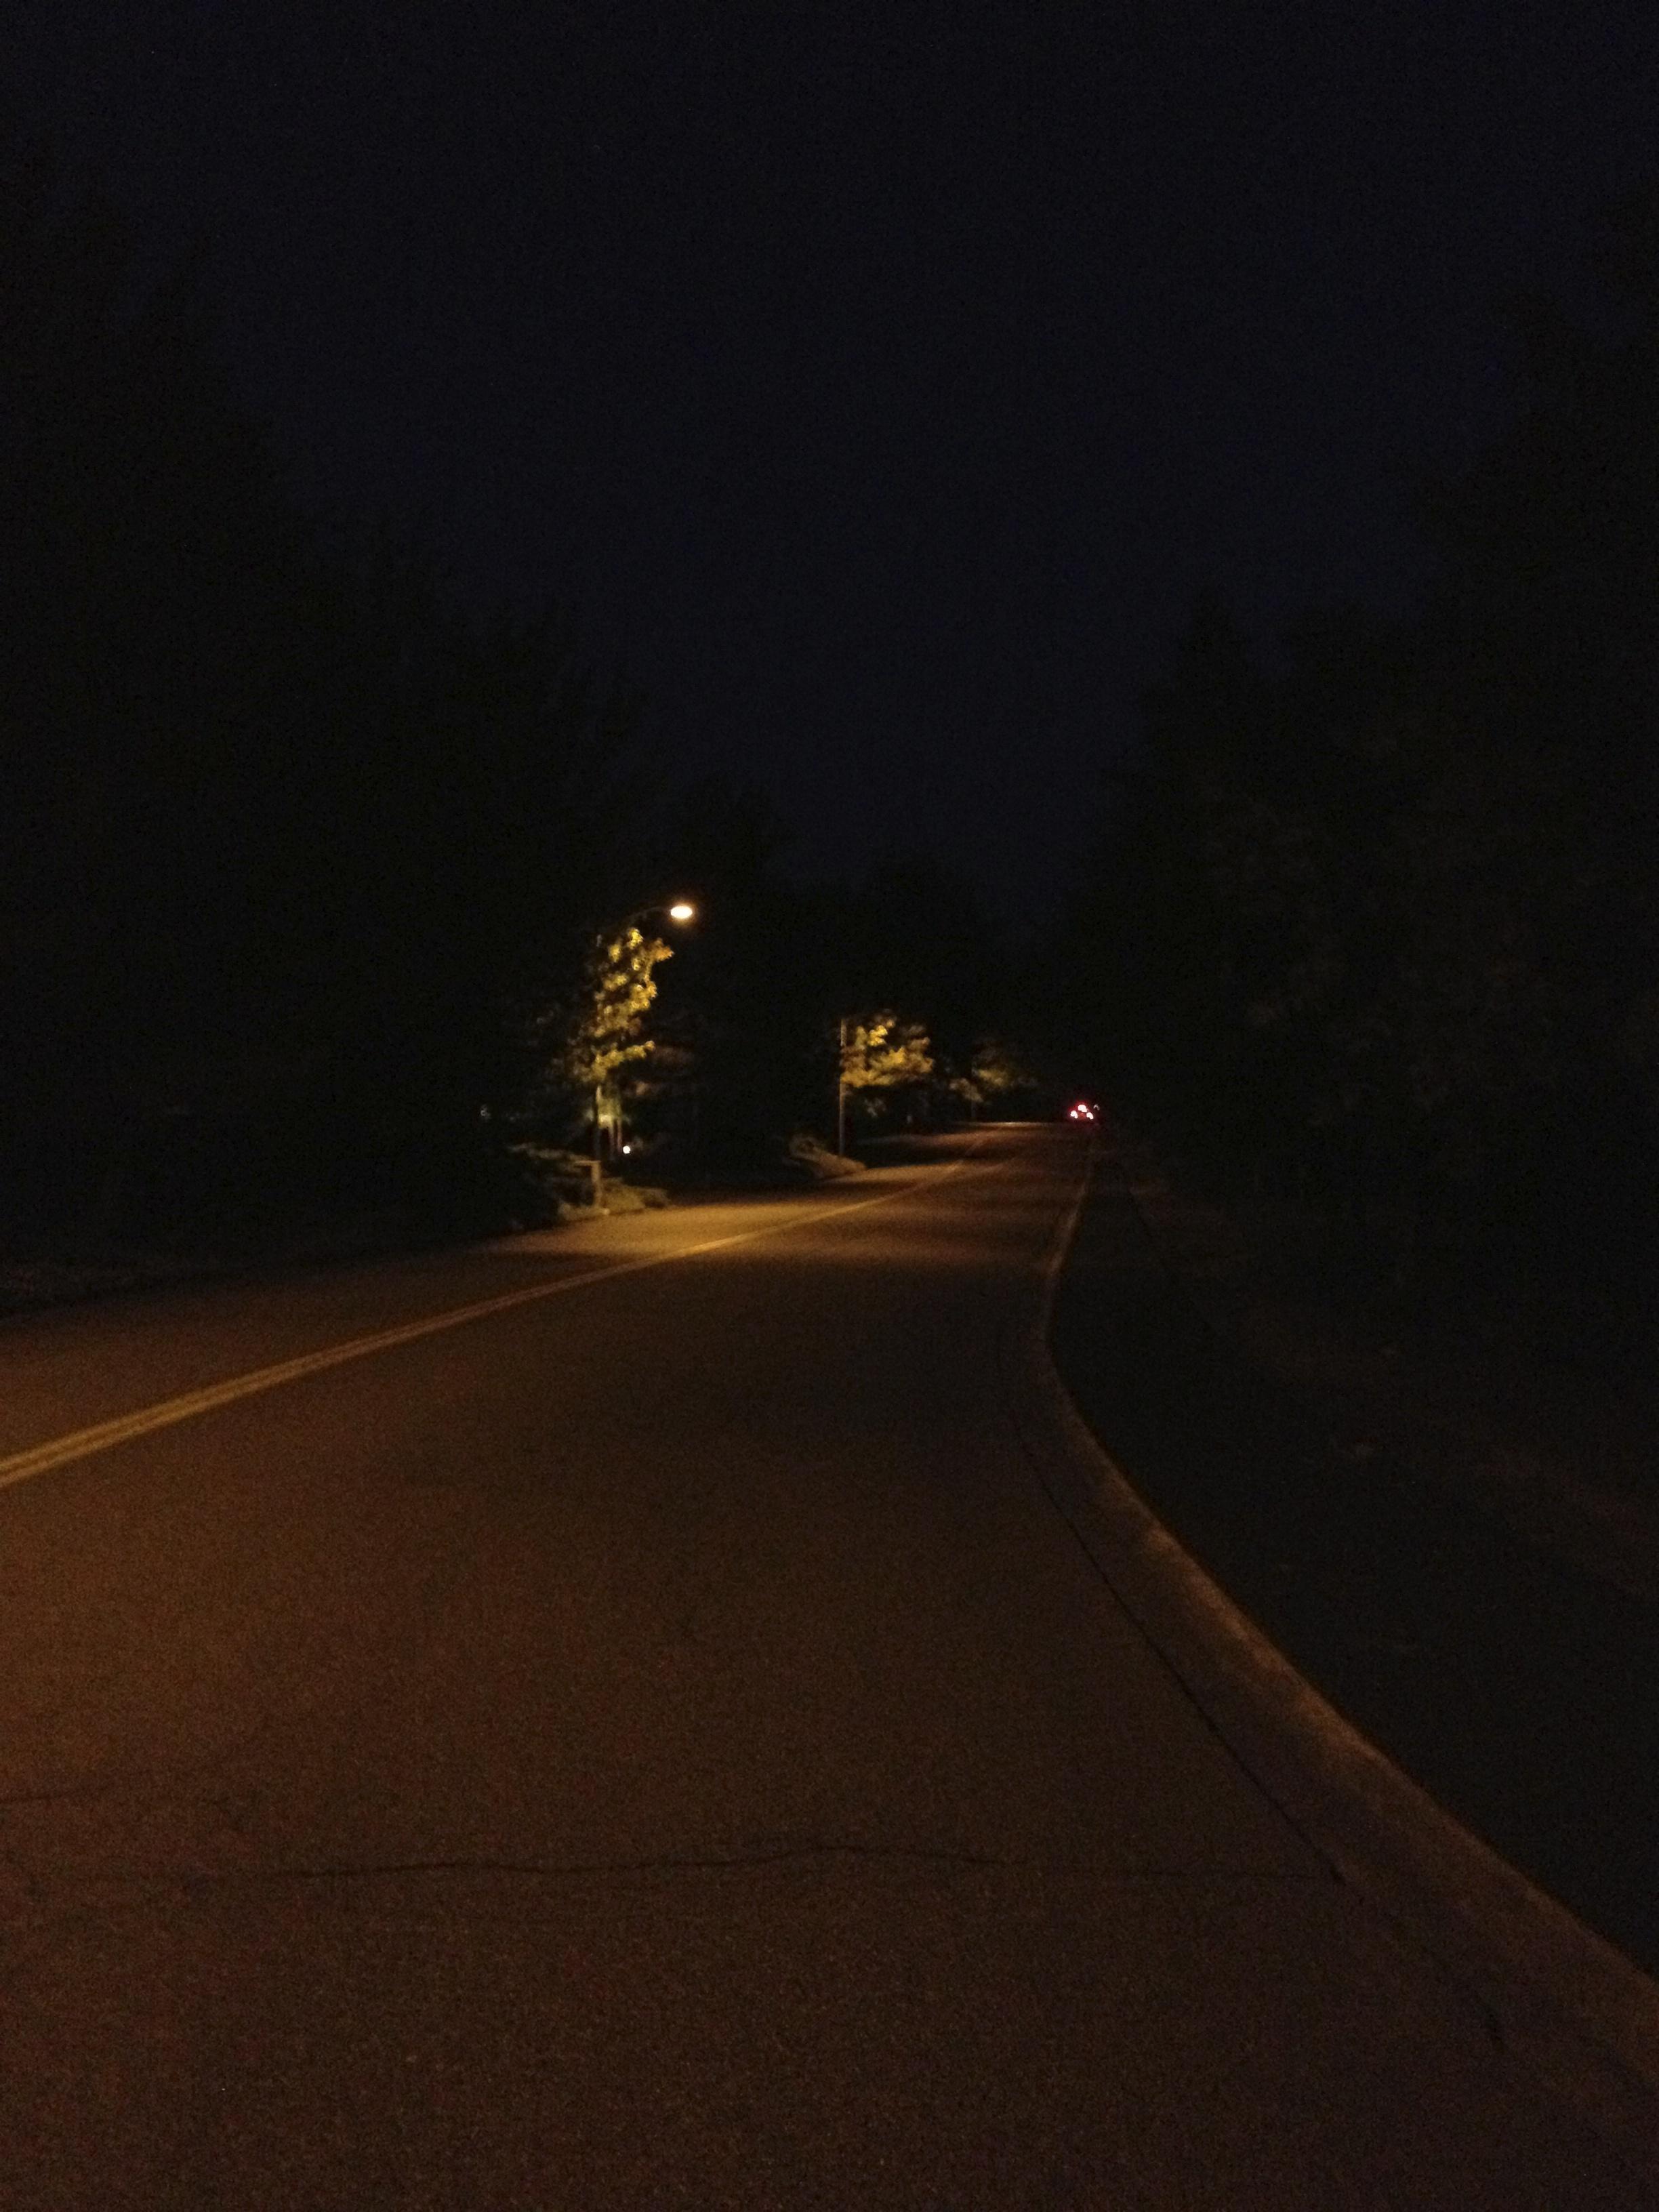 Monroe Parkway LO, 150 Watt HPS